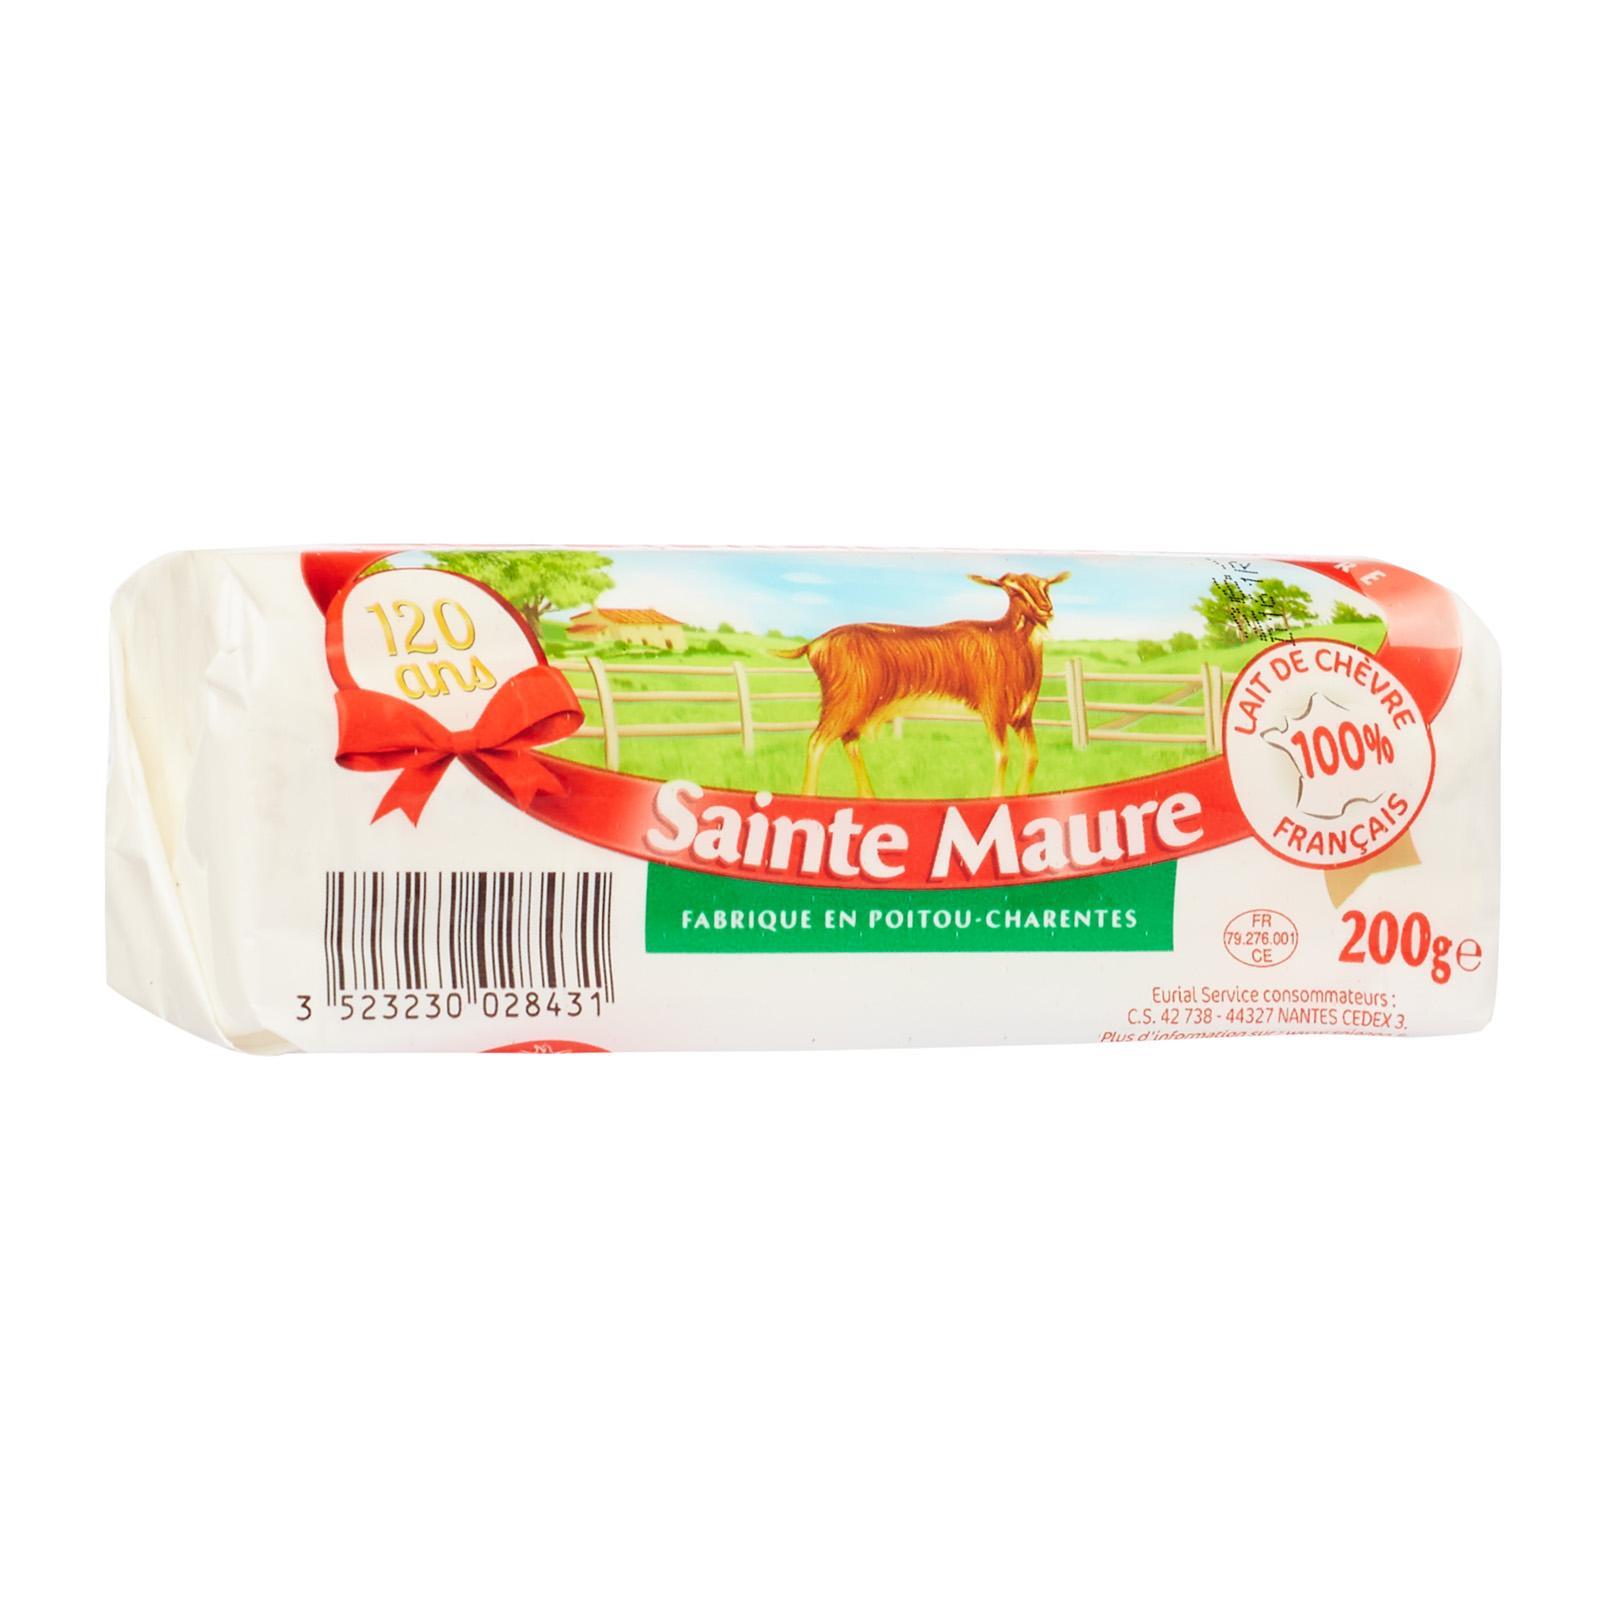 Soignon Sainte Maure Goat Cheese By Redmart.